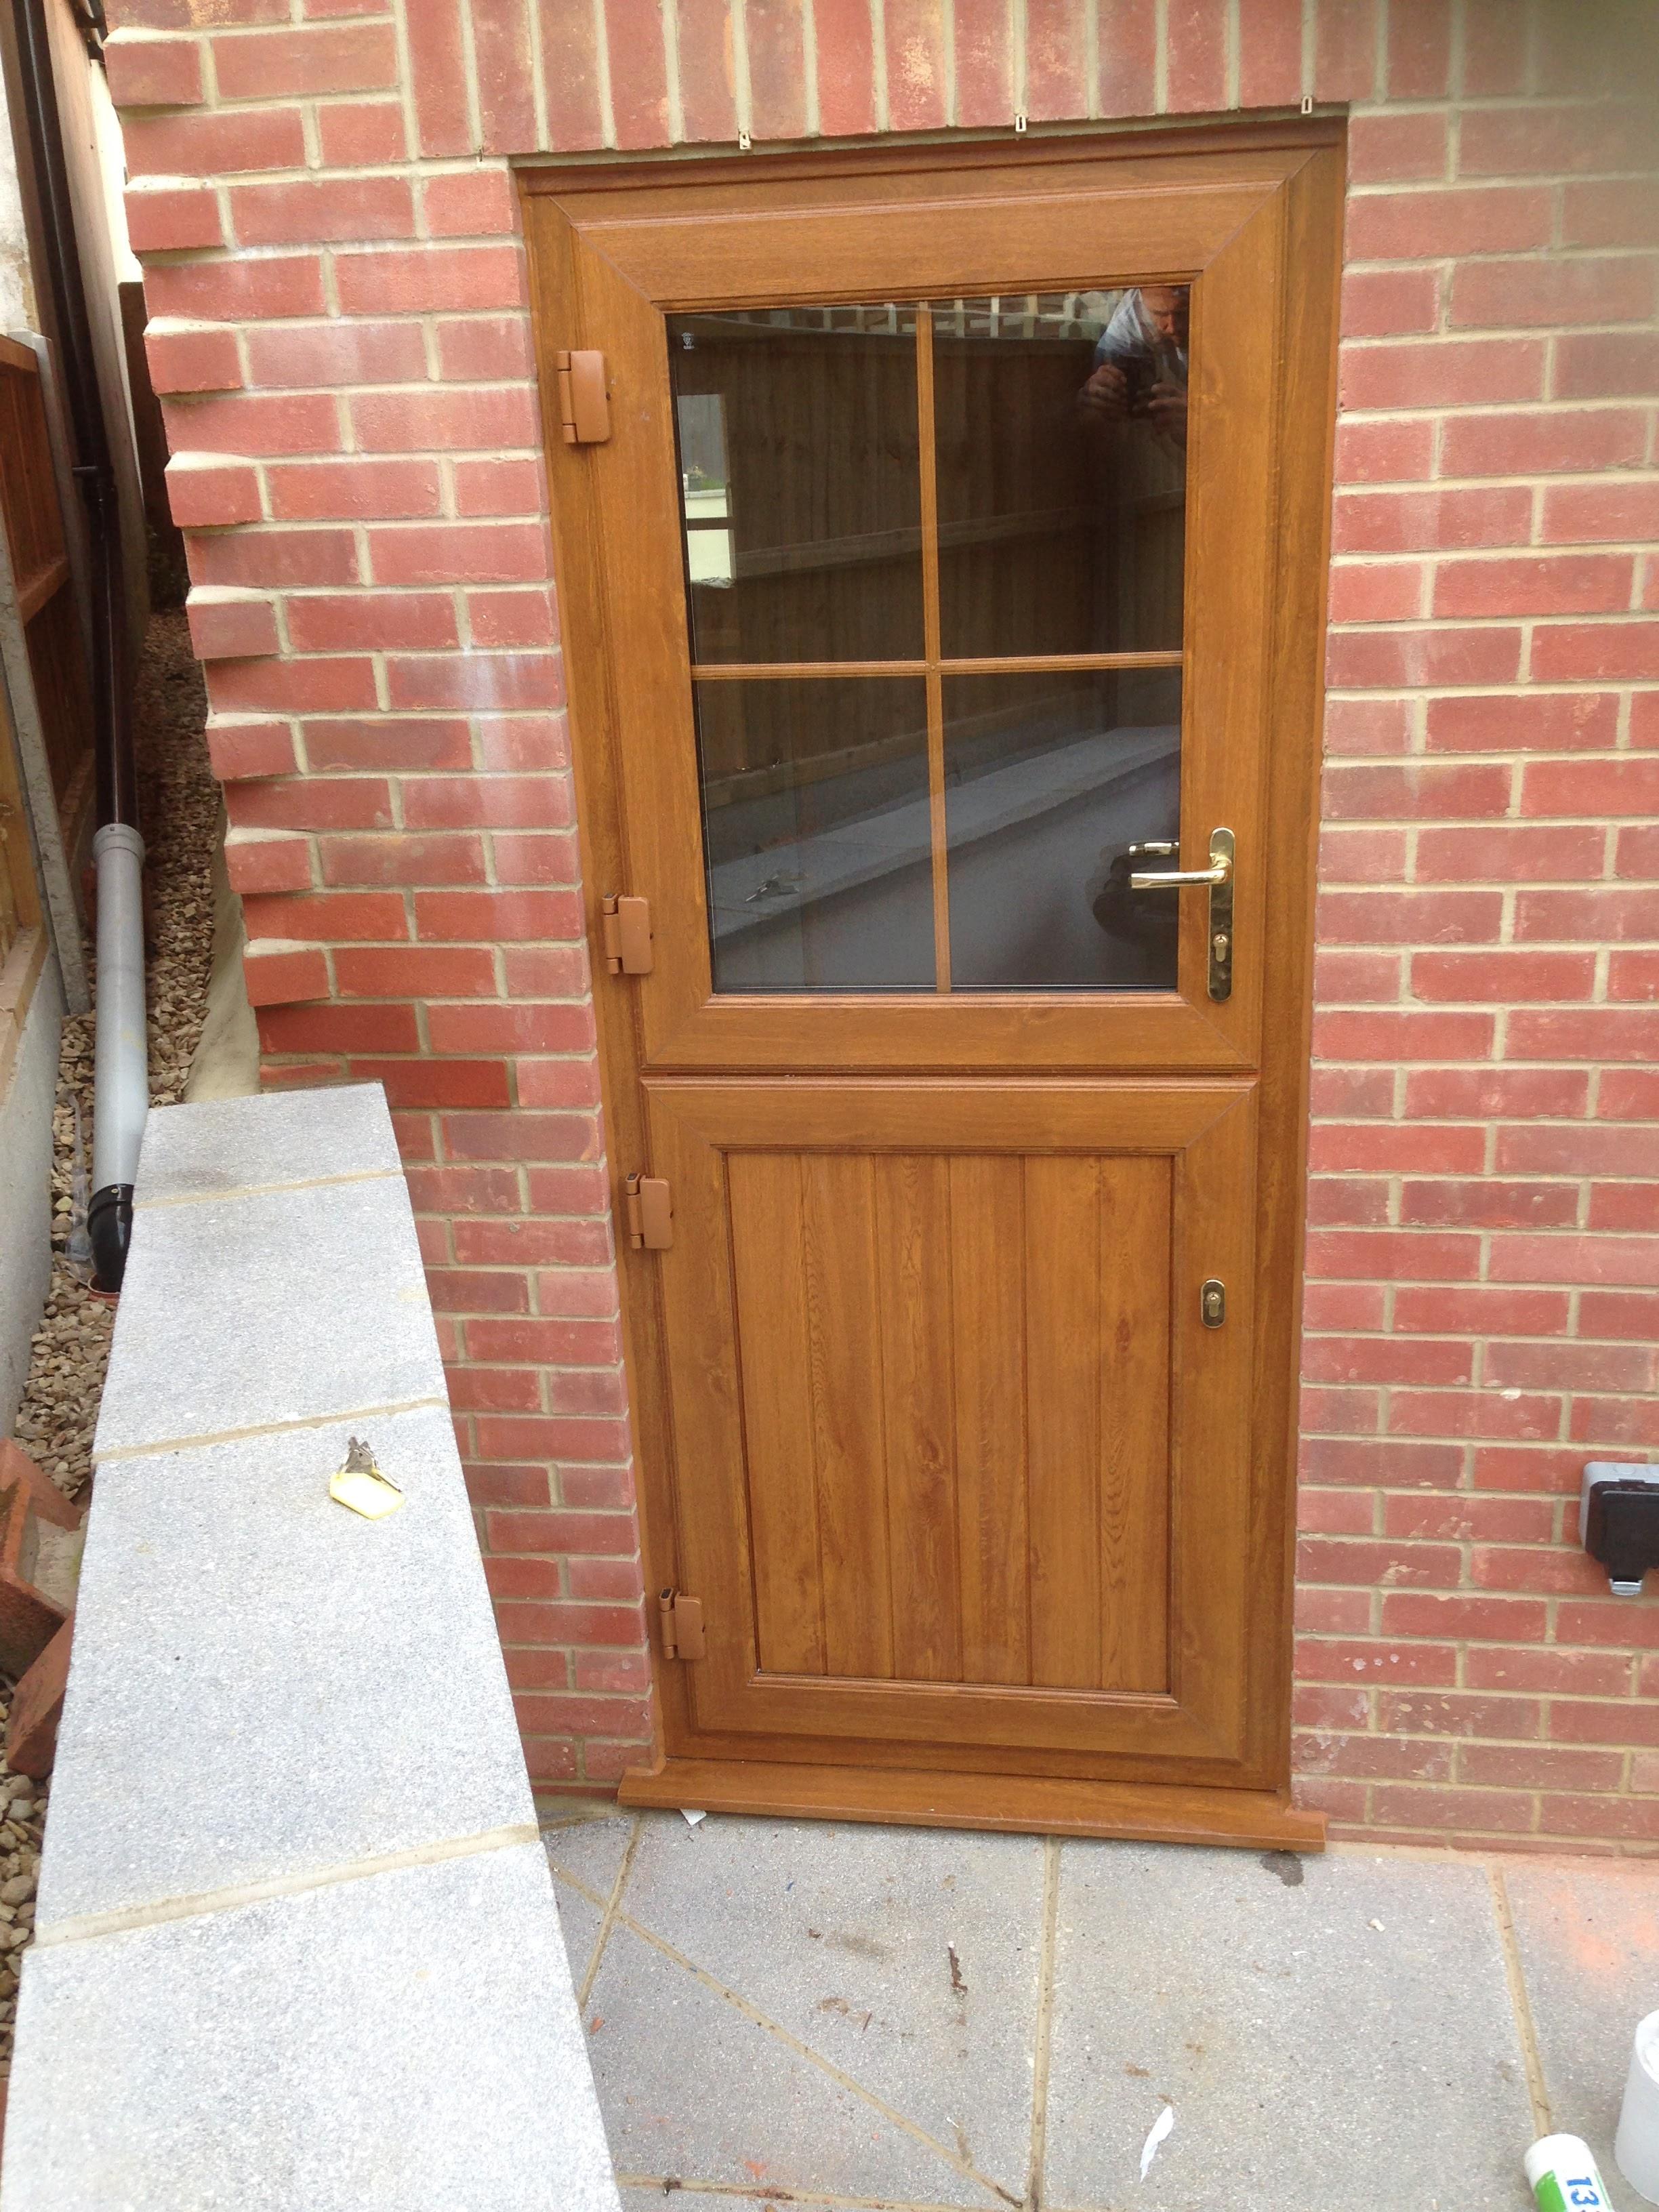 Warm and woody new PVC front door